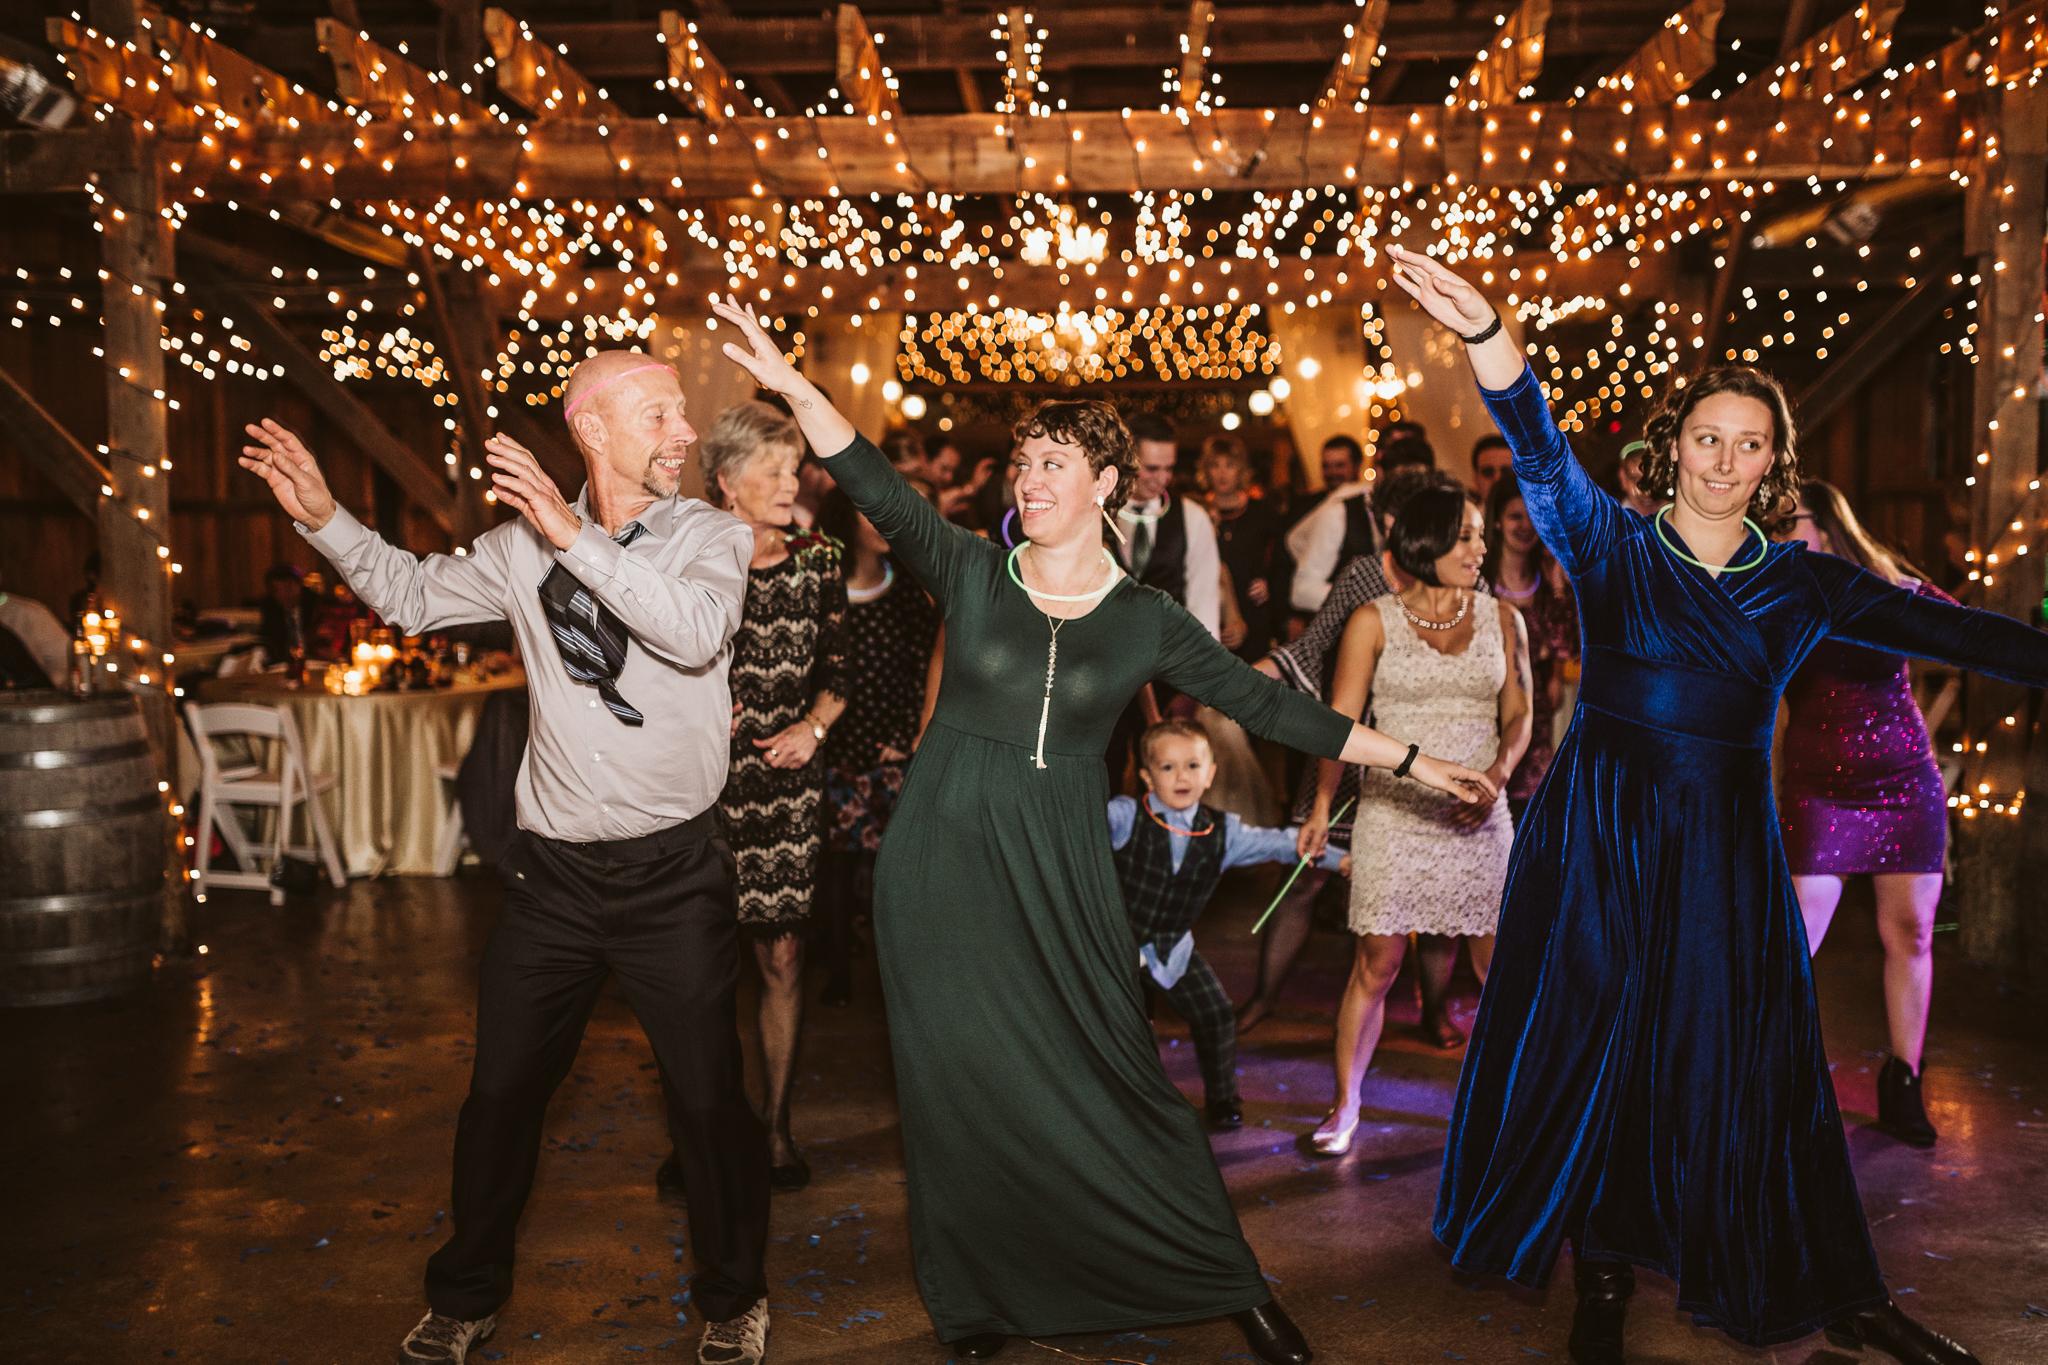 0184 Ariana Jordan Photo - Cameron & Lauren's Wedding at Talon Winery  8585.jpg